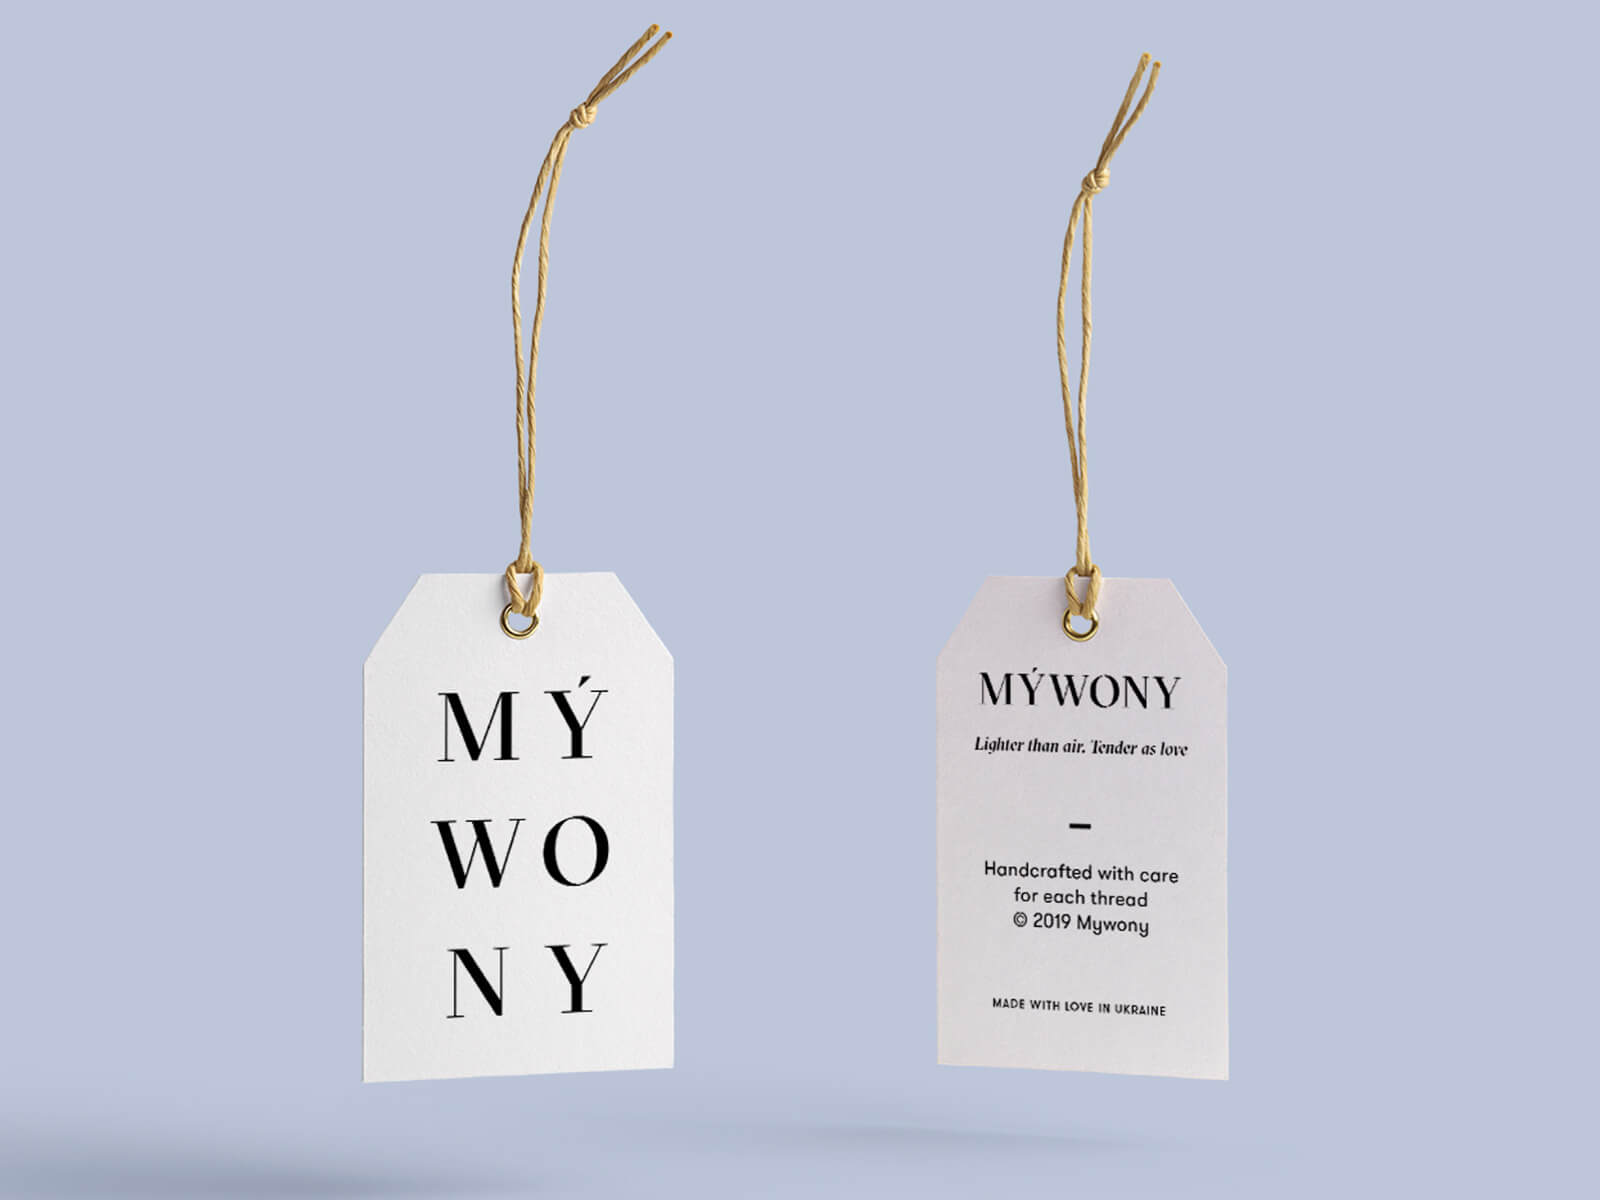 mywony branding design